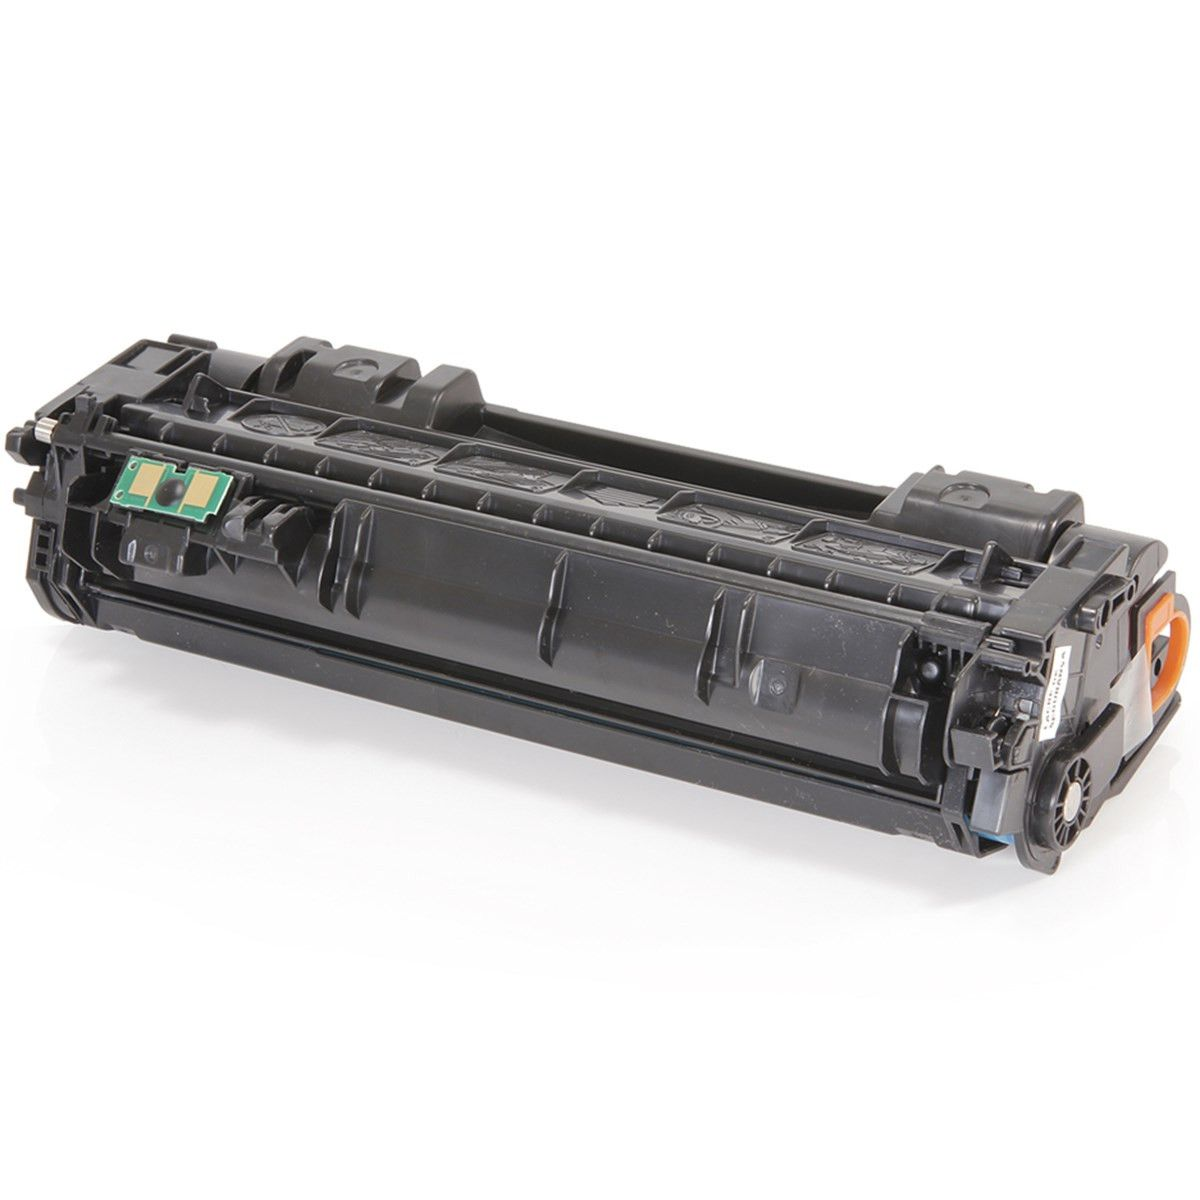 TONER COMPATÍVEL COM HP Q7553A 53A P2015 P2014 M2727 P2015N P2014N 2.500 Páginas - Cartucho & Cia